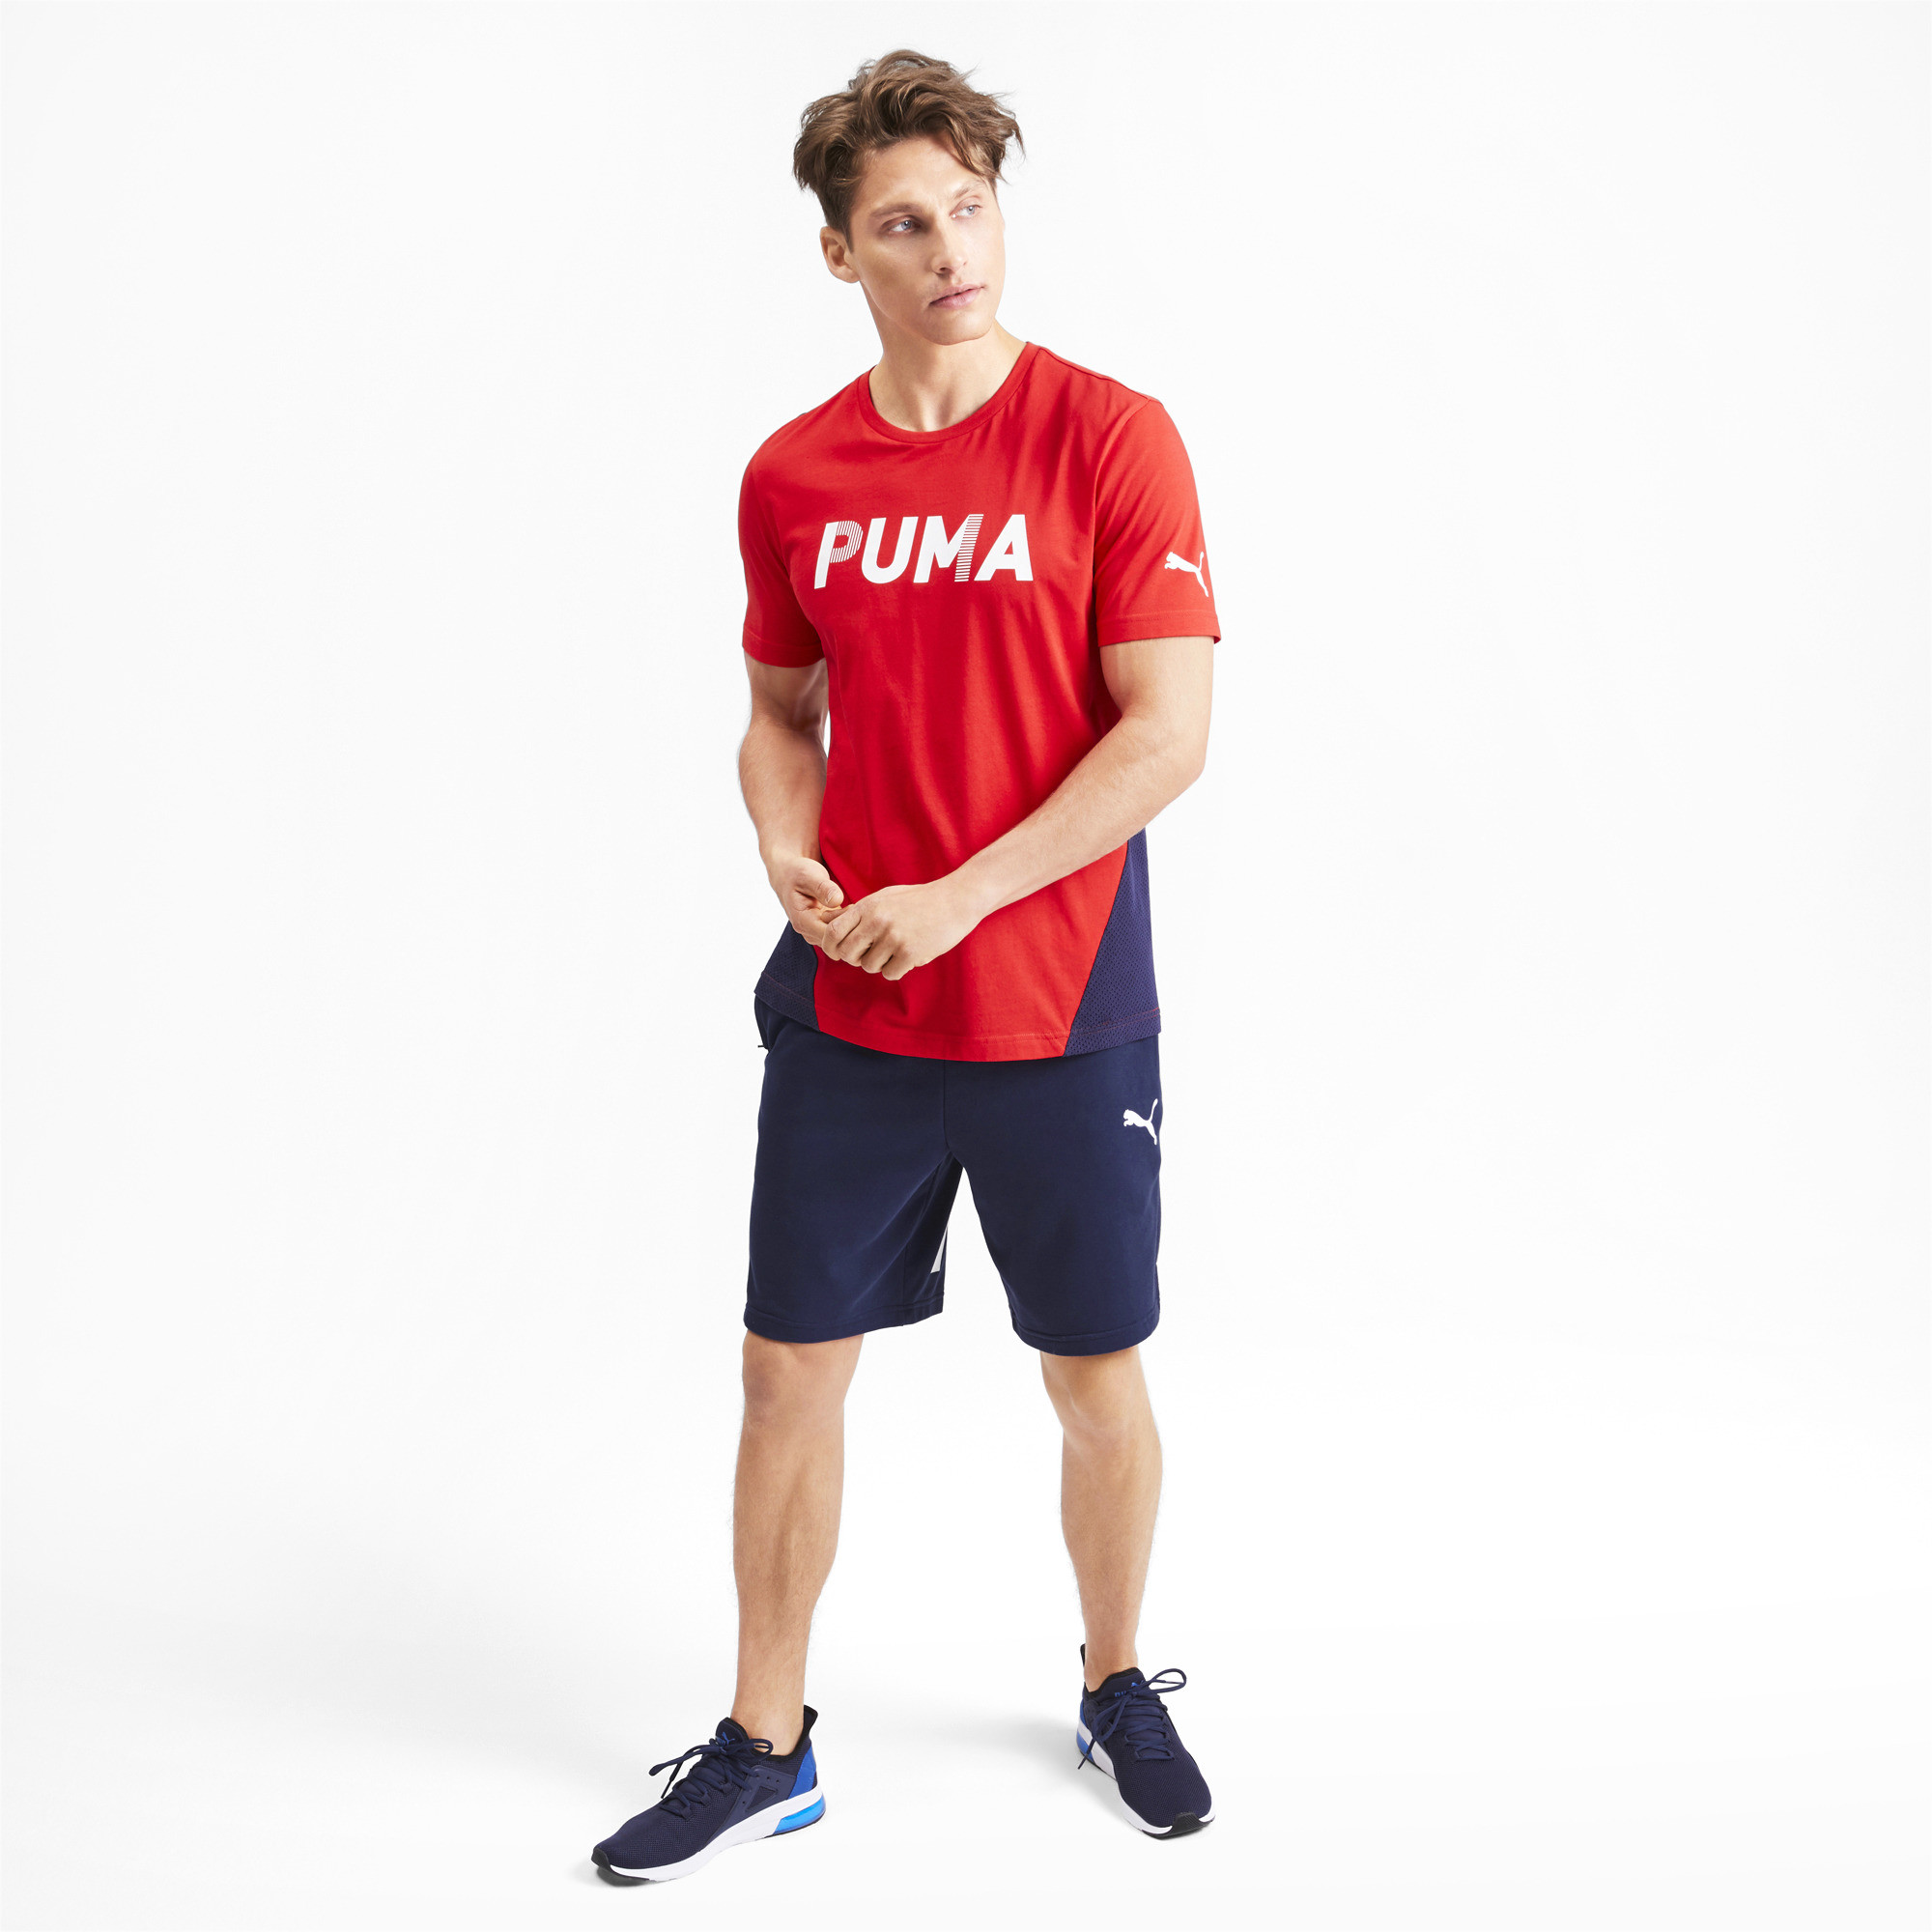 PUMA-Modern-Sports-Men-039-s-Shorts-Men-Knitted-Shorts-Basics thumbnail 16